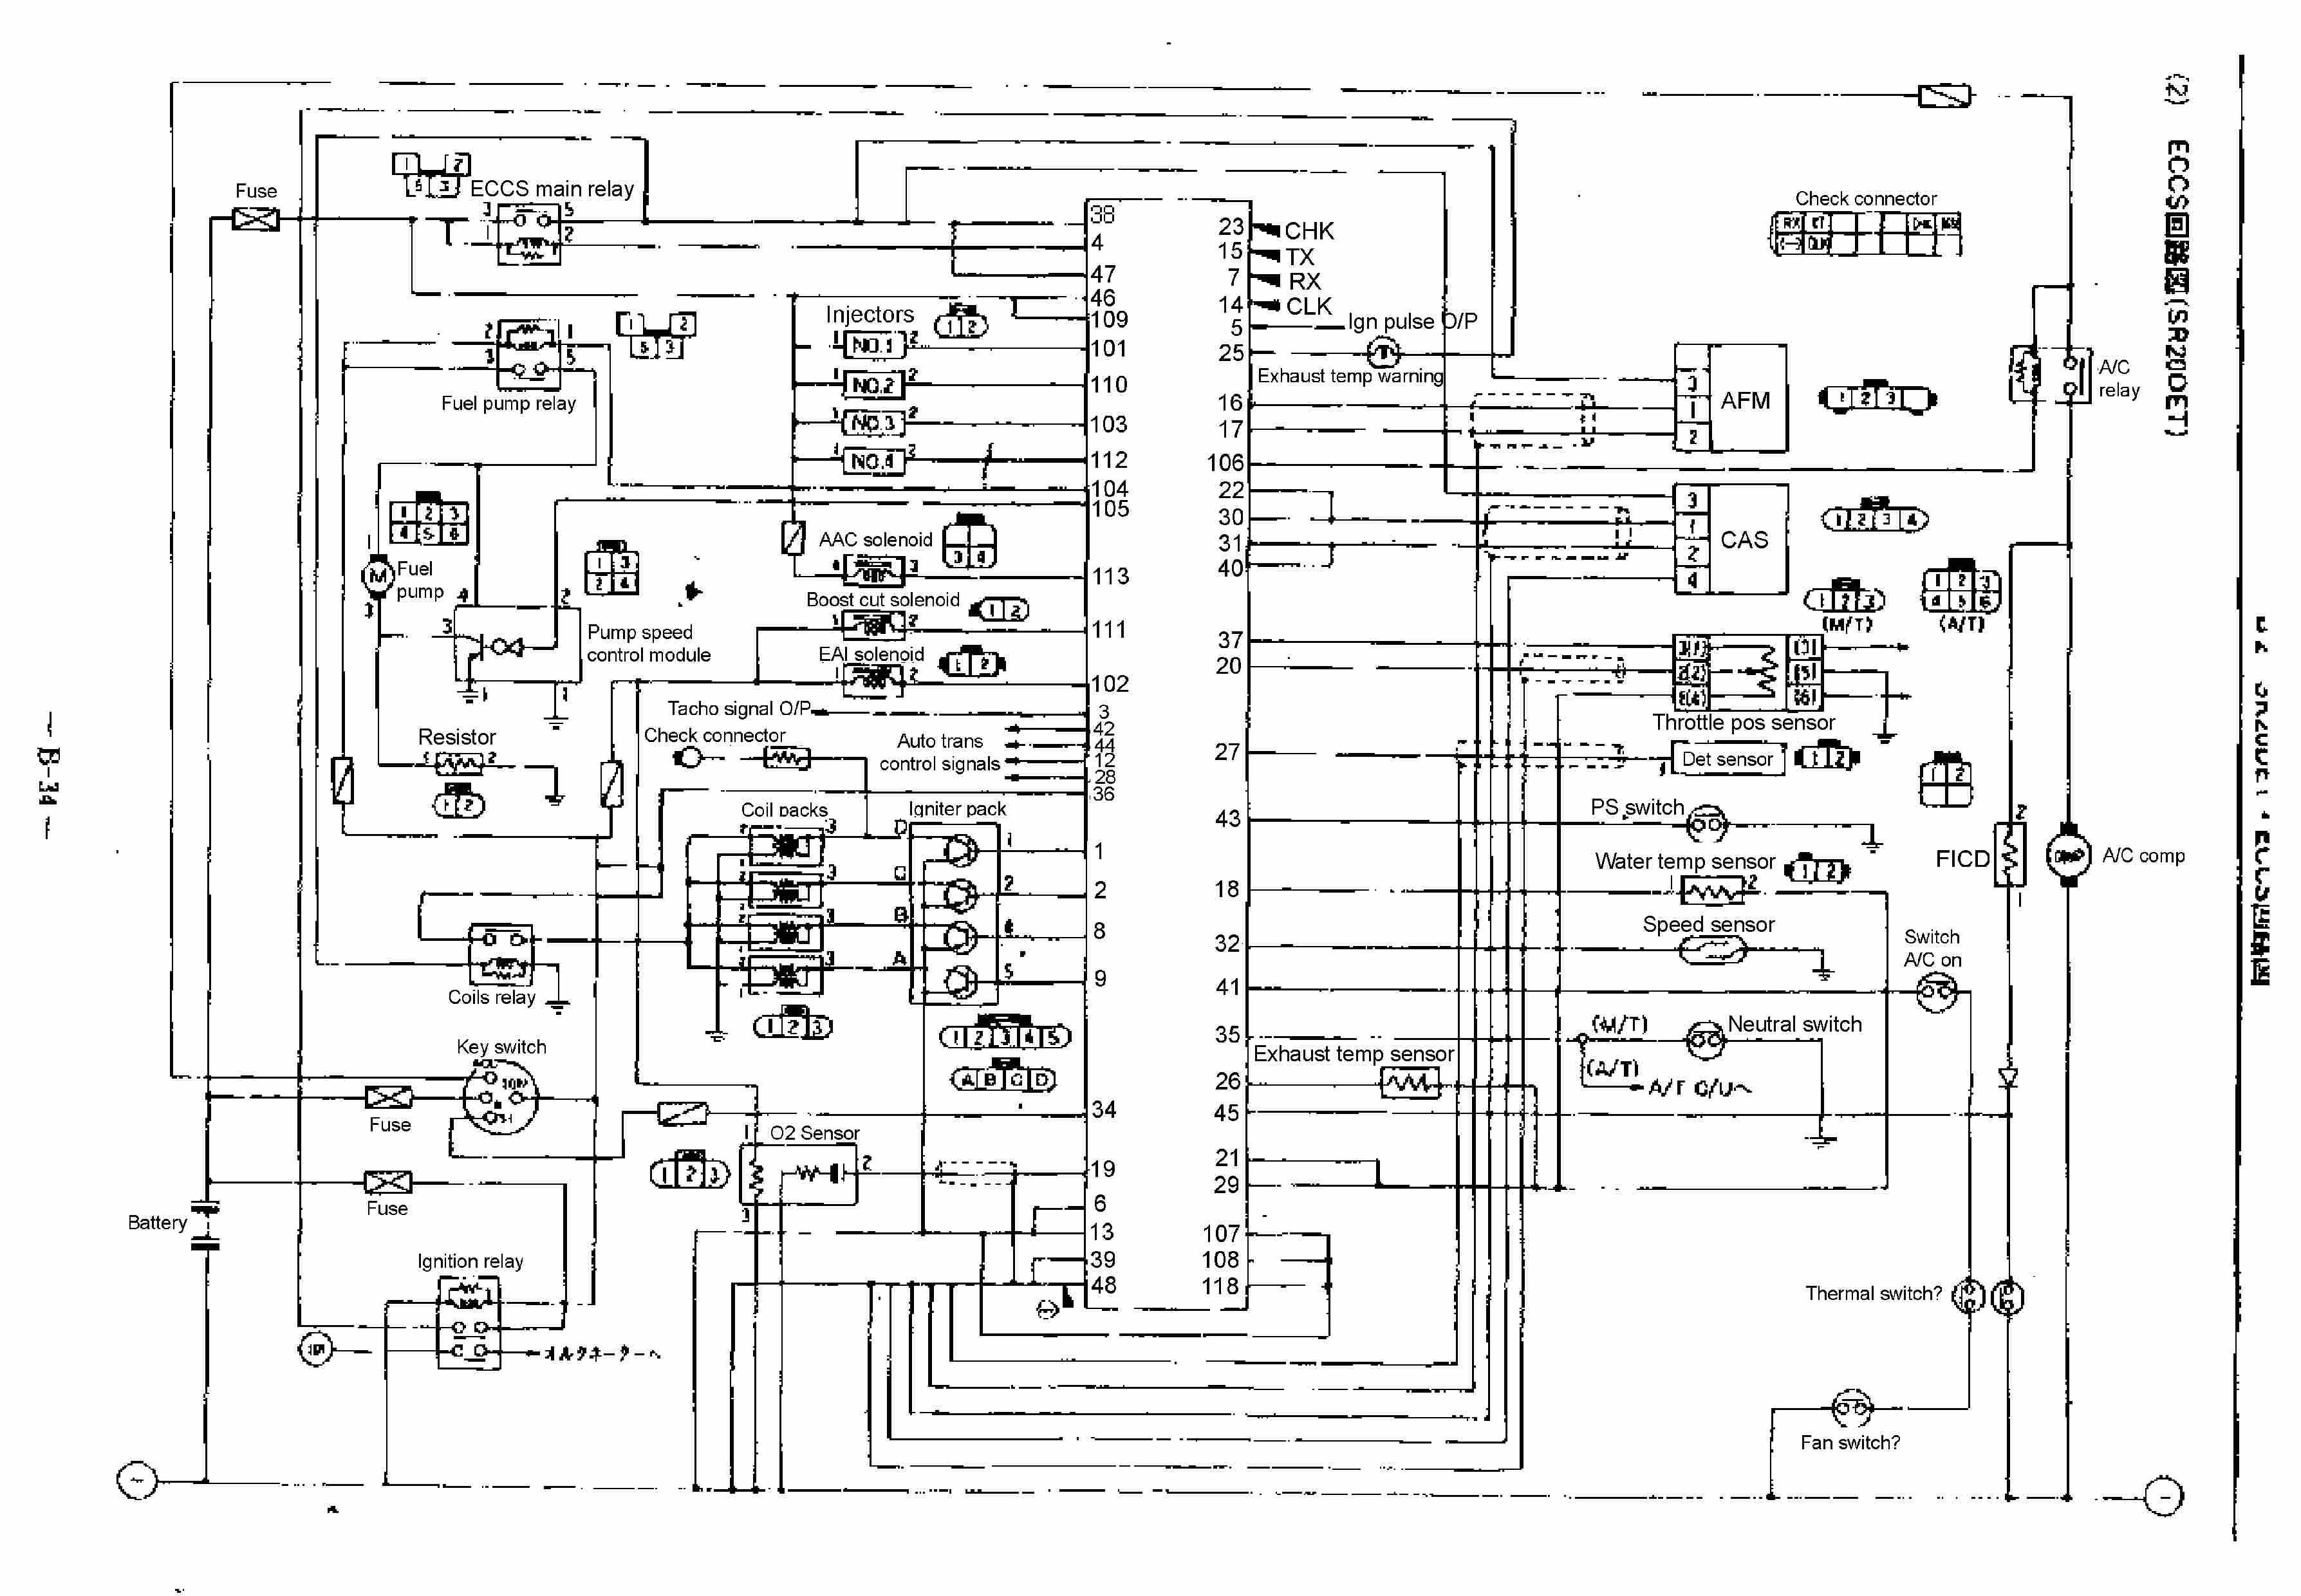 Car Inspection Diagram 22 Inspirational Used Car Inspection Of Car Inspection Diagram